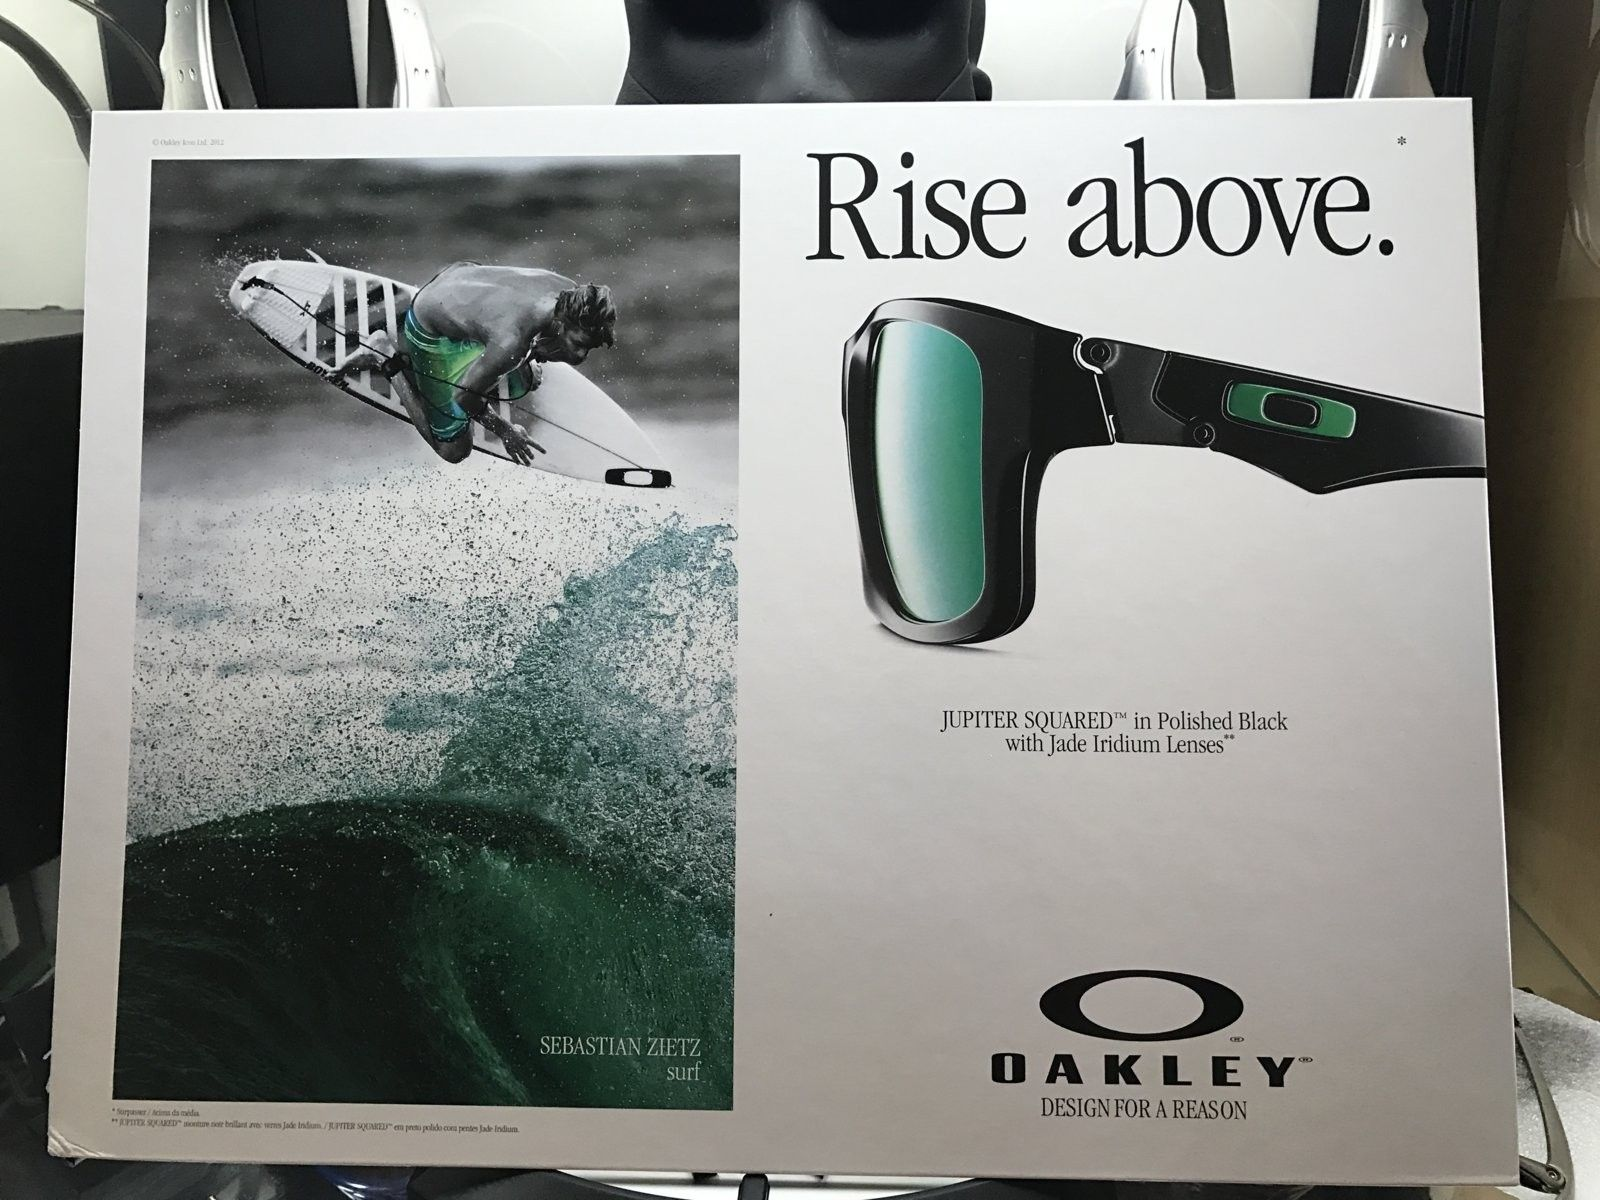 Big display card - Sebastian Zietz - surf - Jupiter squared - Oakley icon ltd 2012 - IMG_4780.JPG